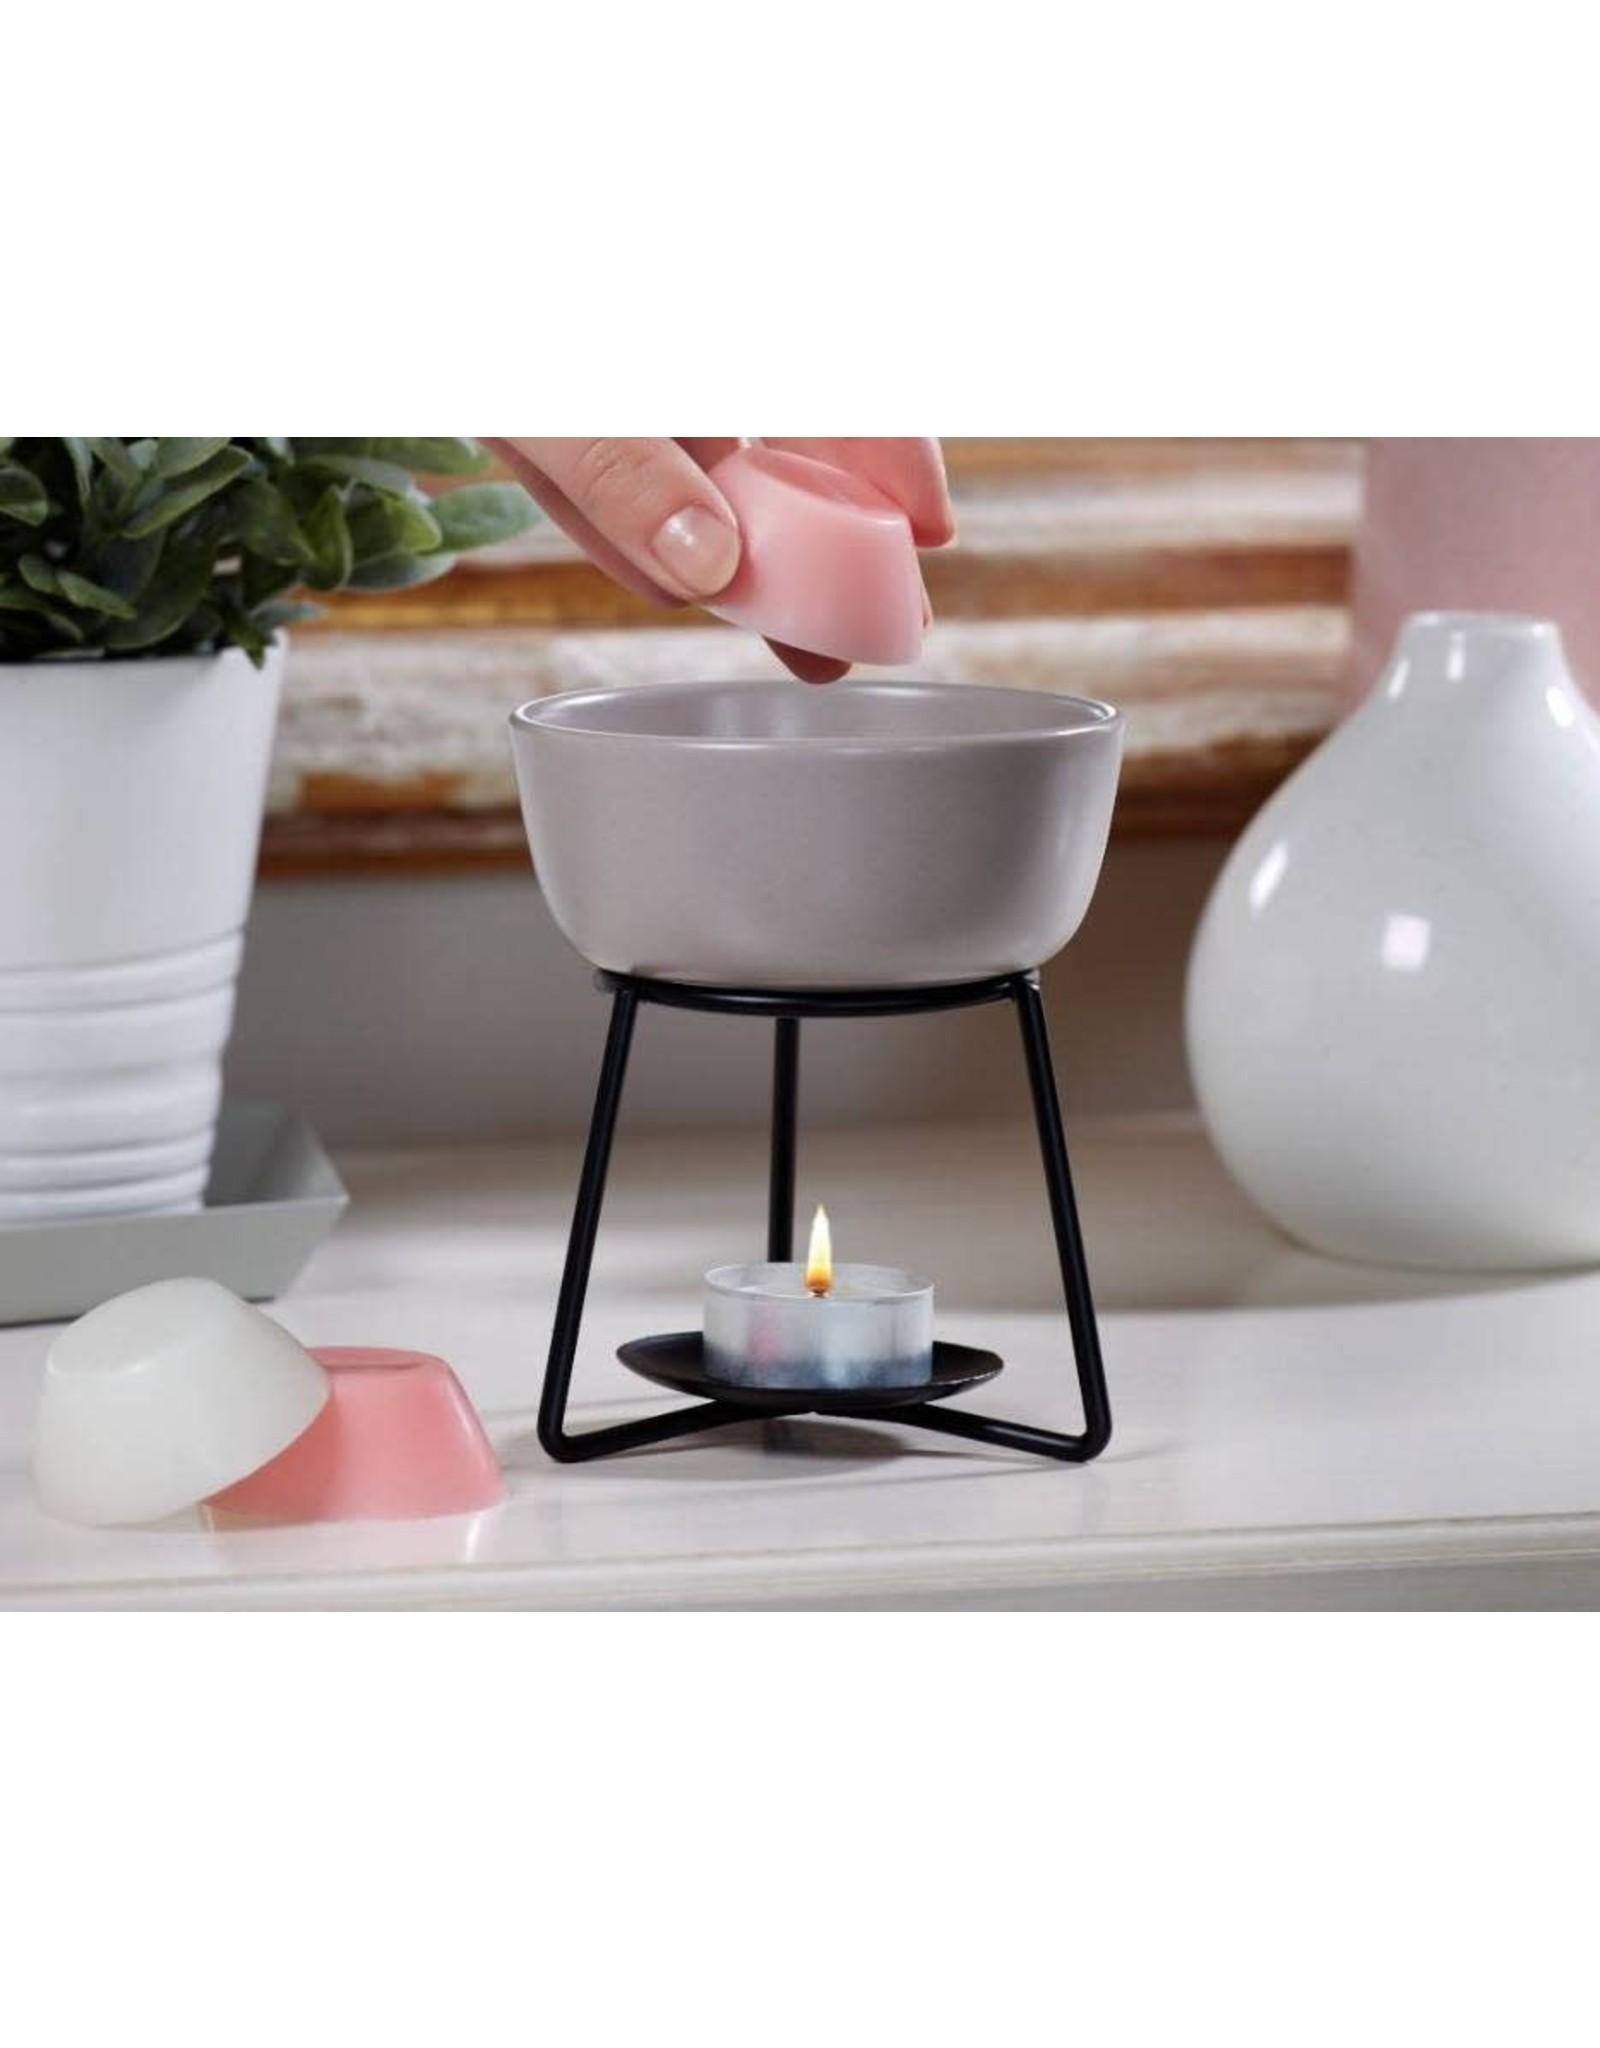 Yankee Candle Melt Warmer Pure Cashmere